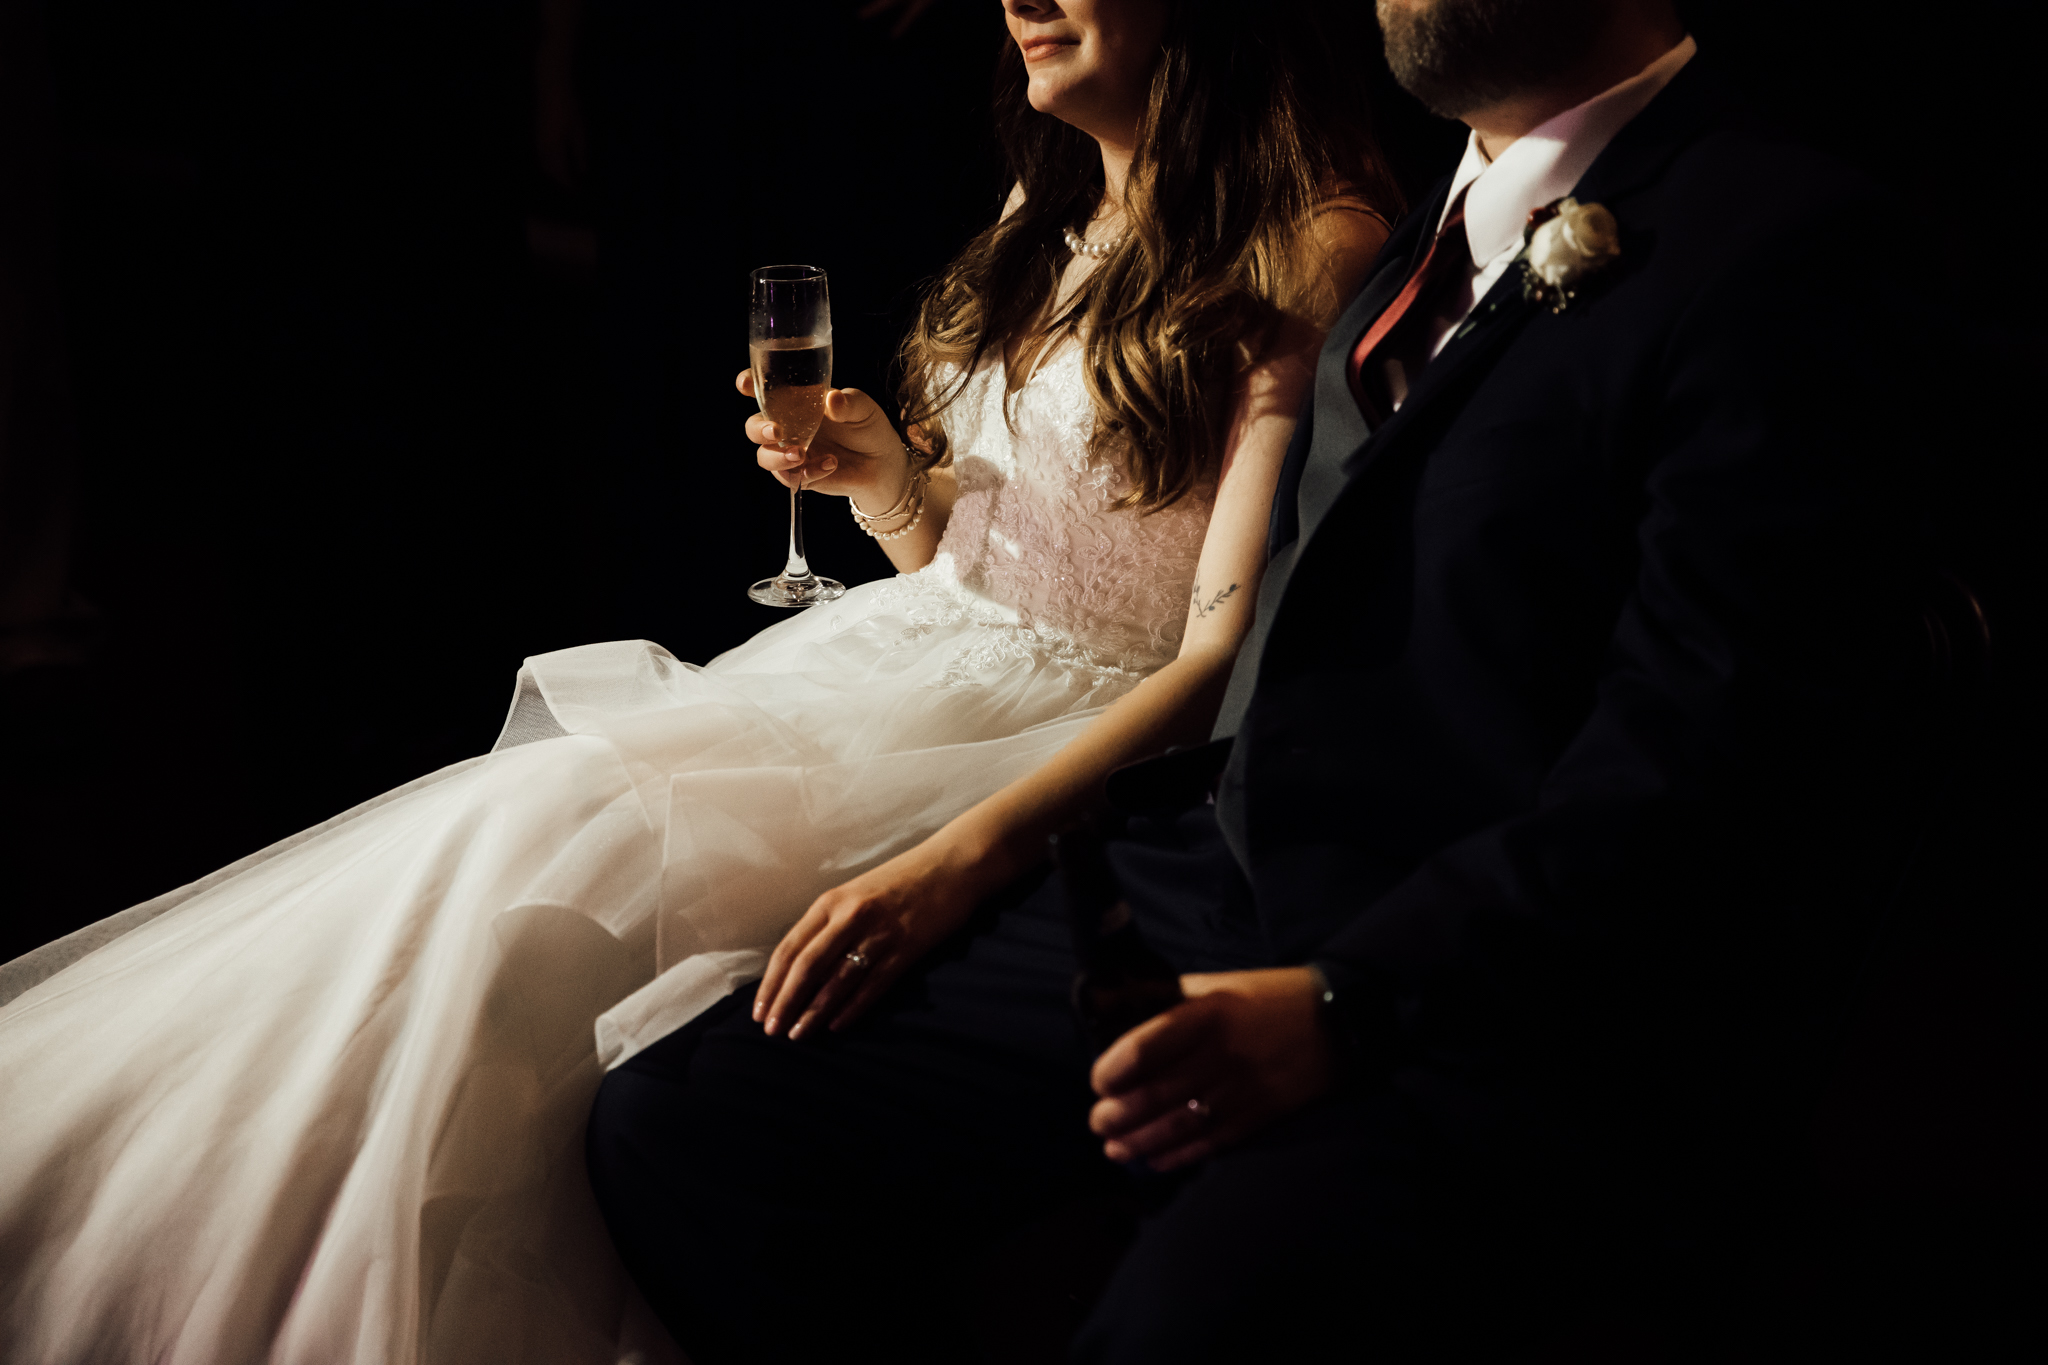 memphis-wedding-photographers-thewarmtharoundyou-ballinese-ballroom (210 of 232).jpg